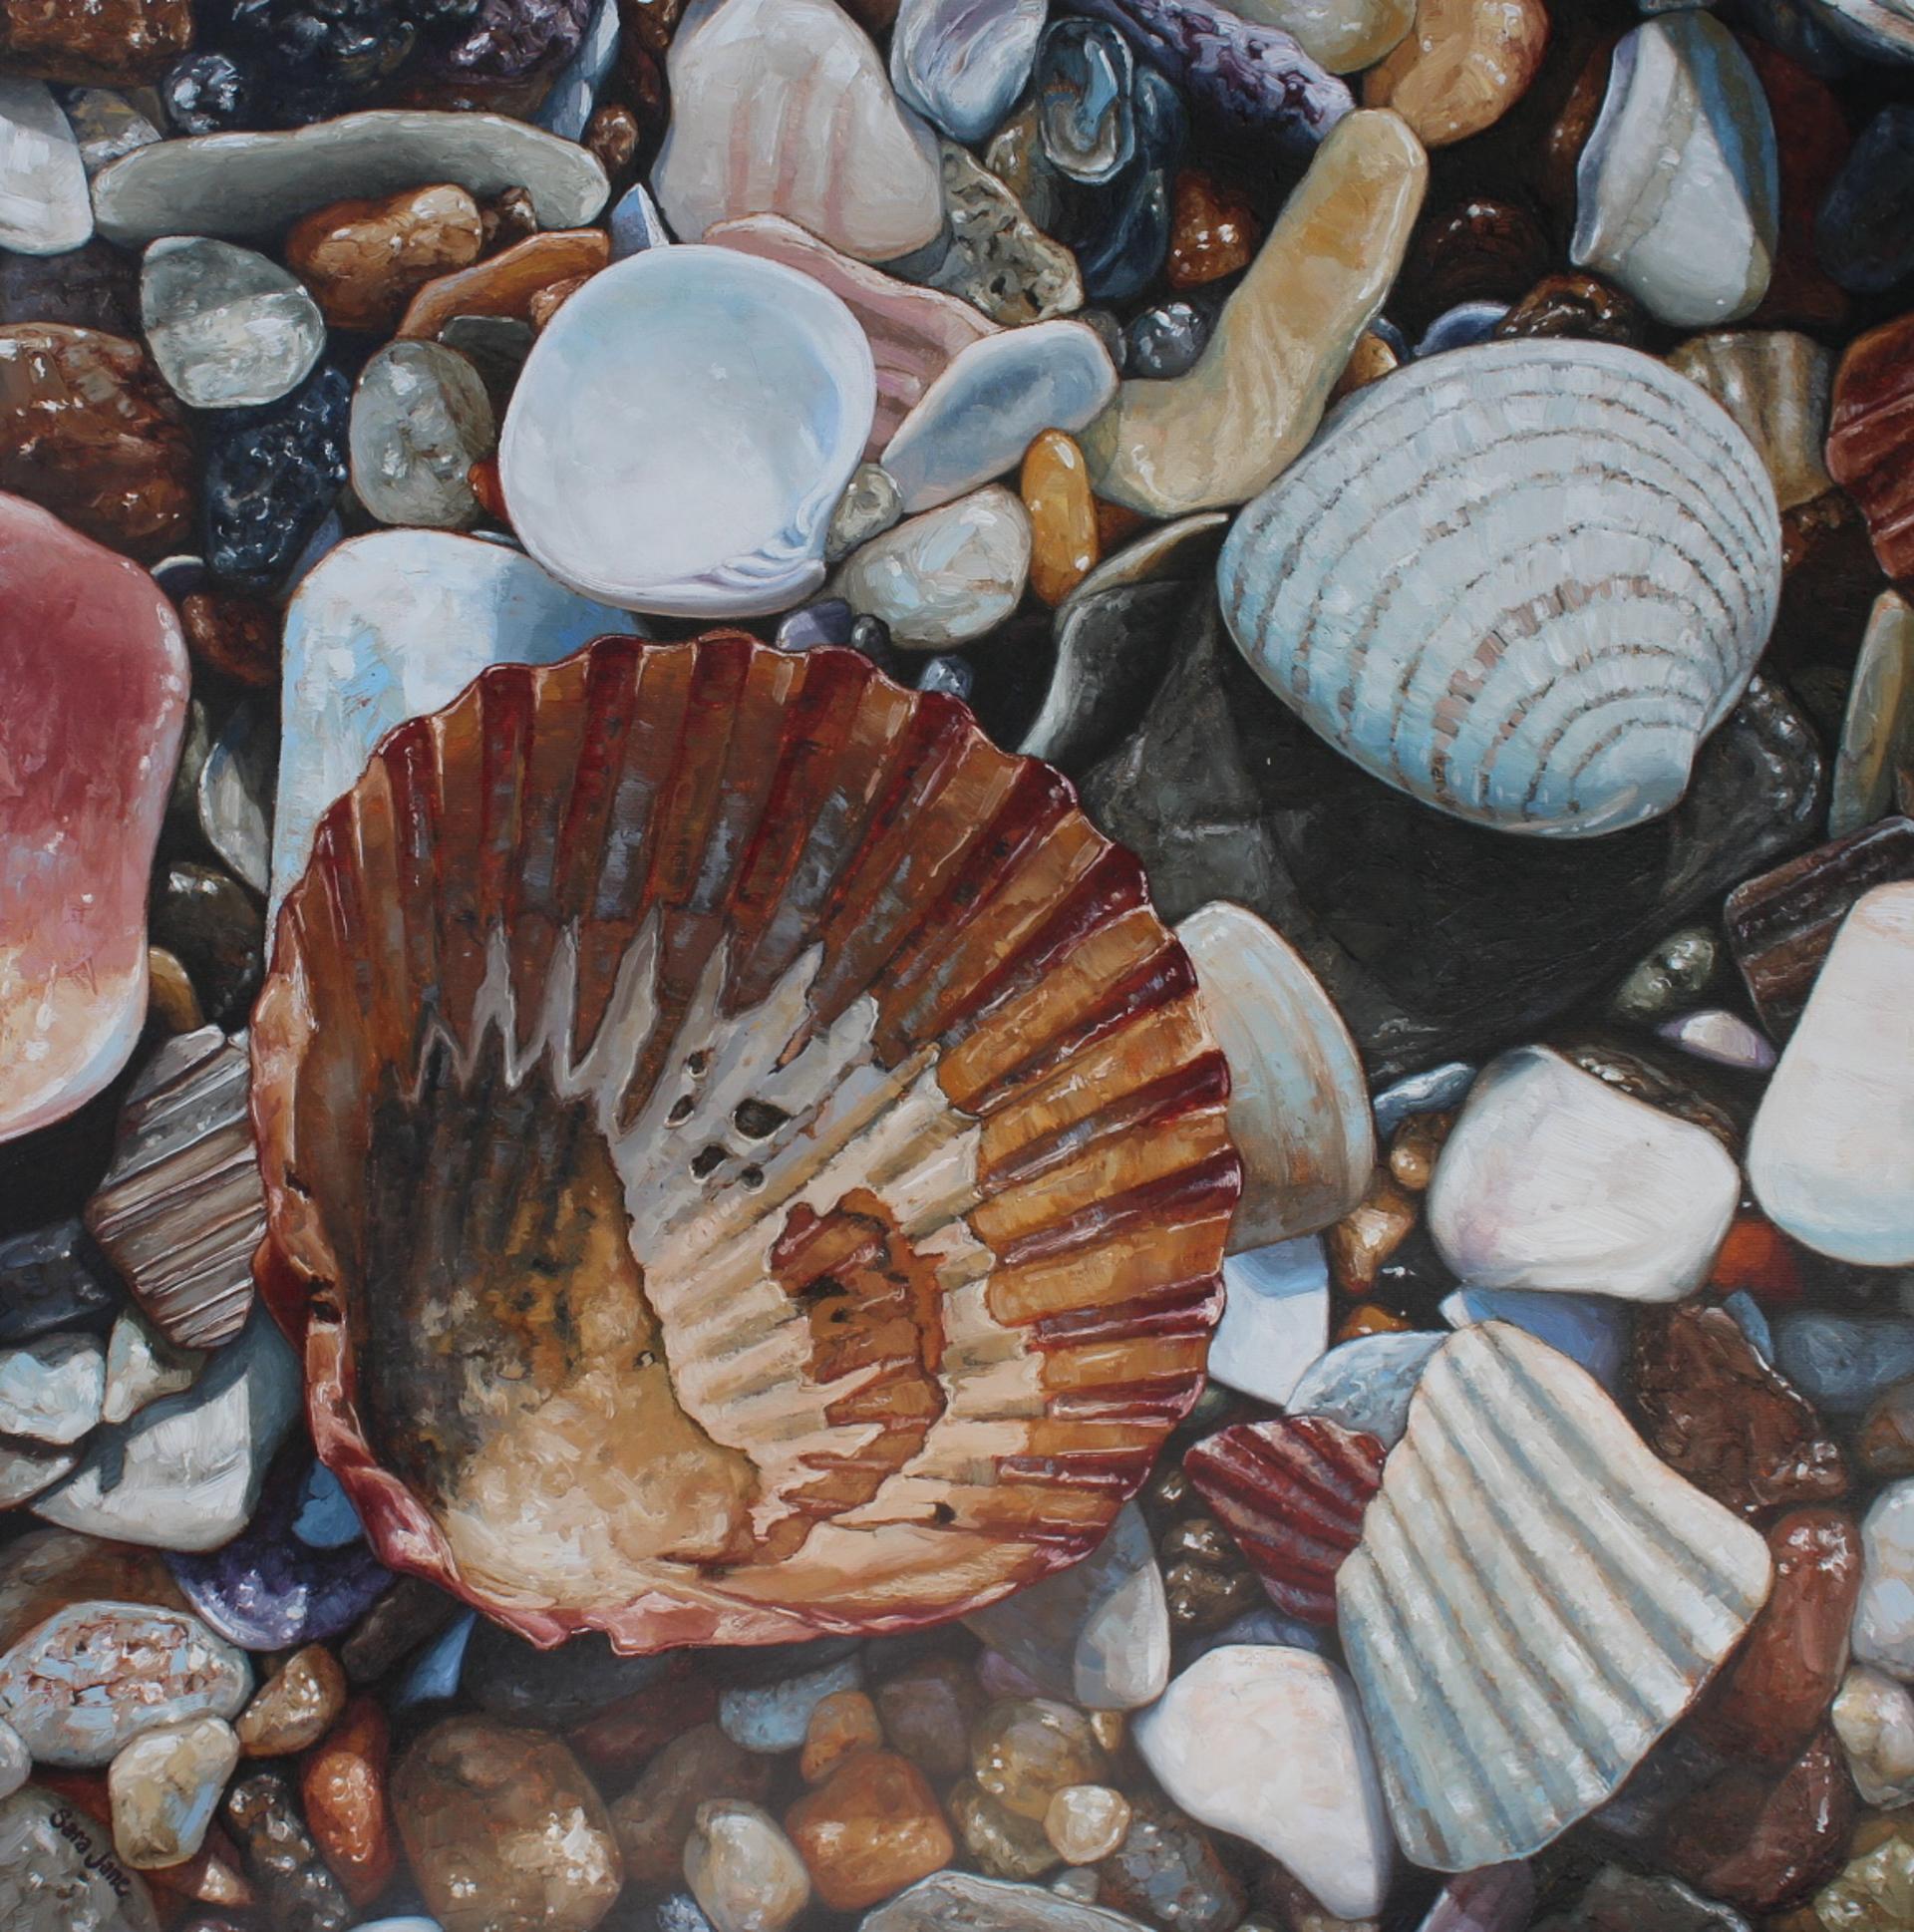 Seacret Love by Sara Jane Doberstein